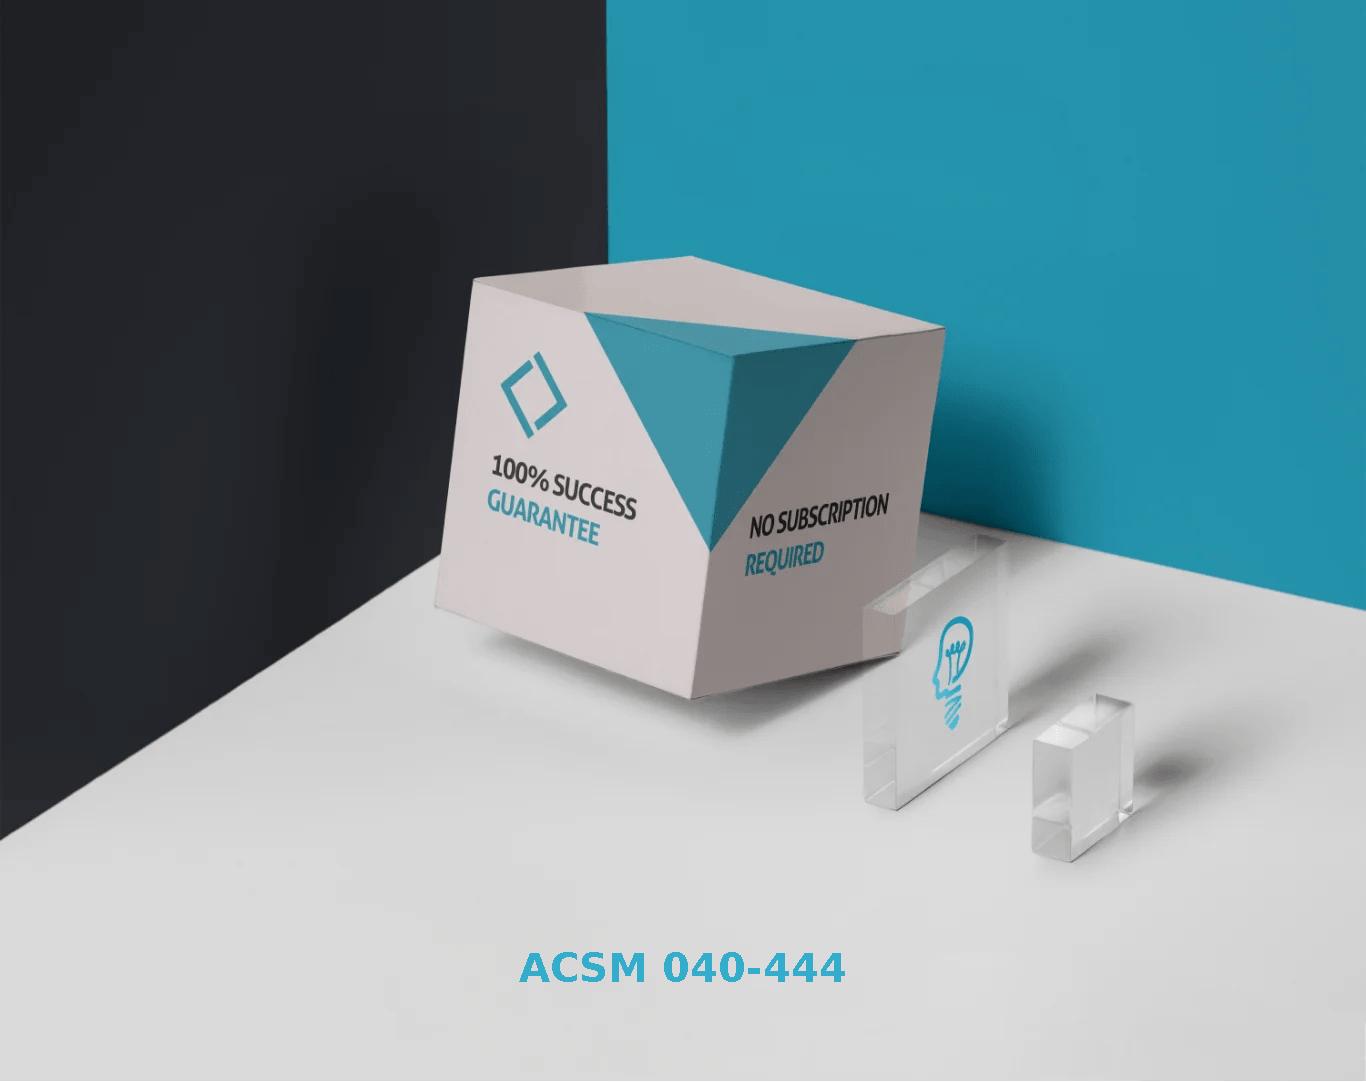 ACSM 040-444 Exams